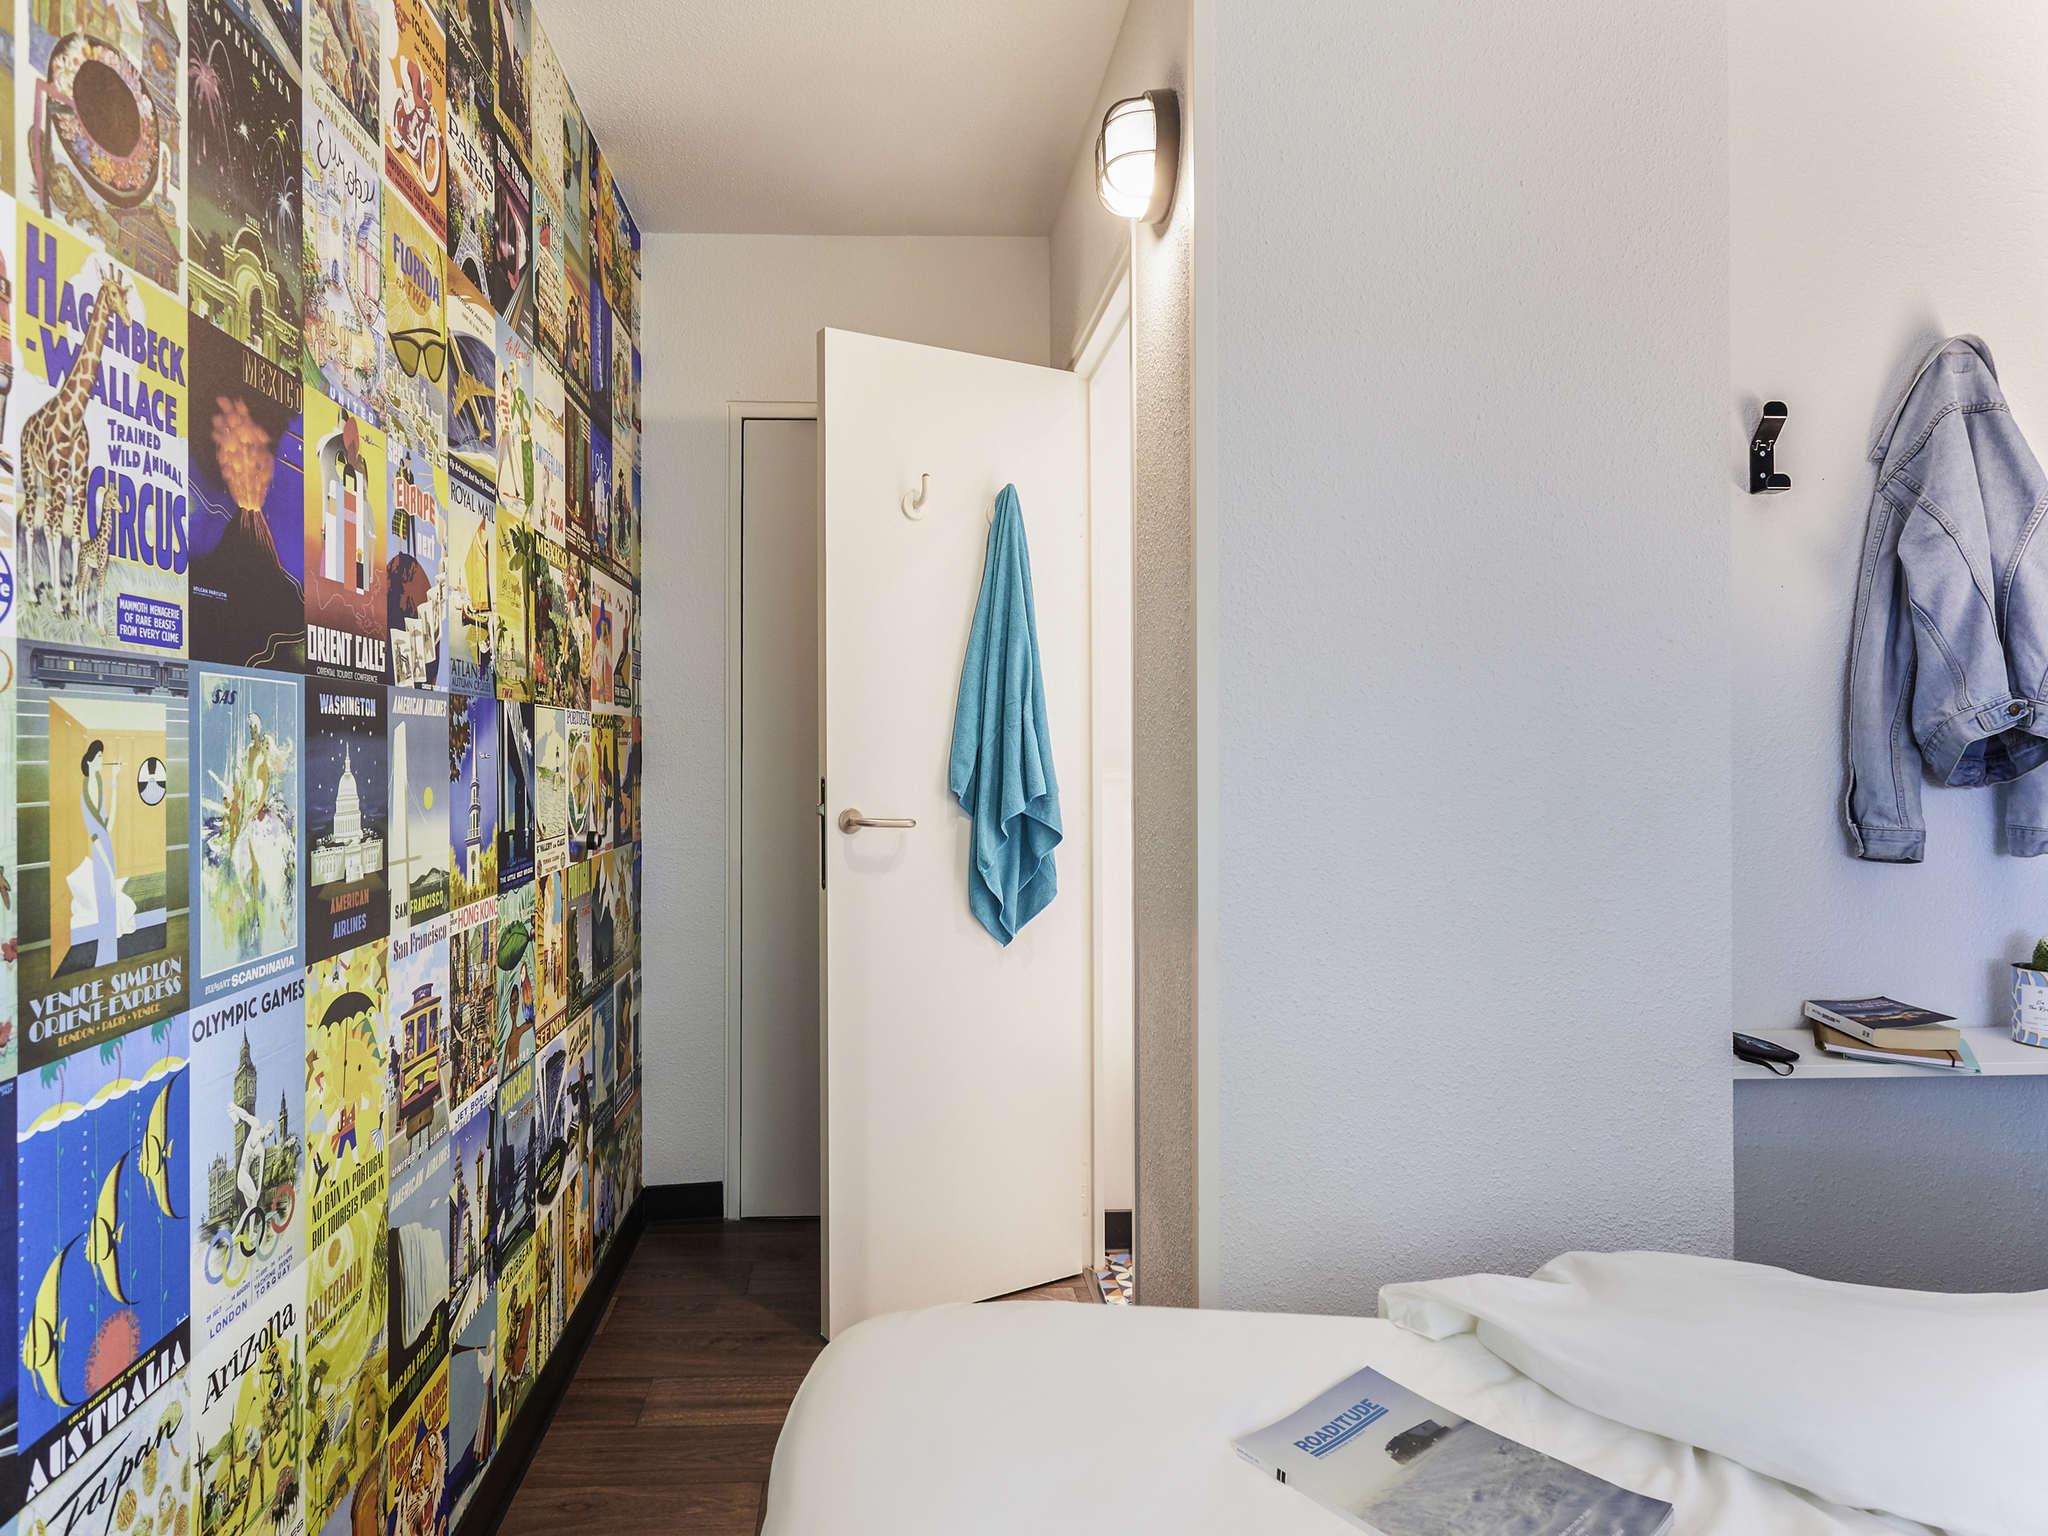 Hotel - hotelF1 Mulhouse Bâle Aéroport